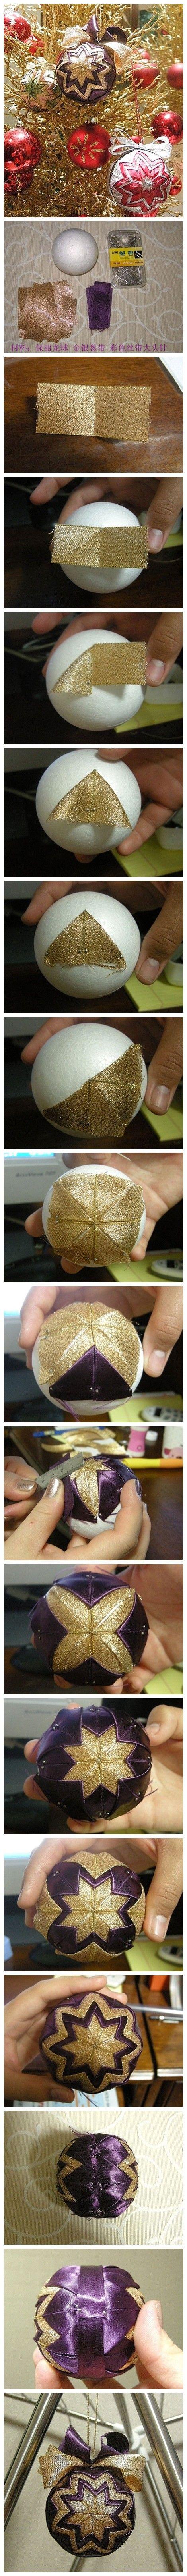 制作圣诞节挂饰,快来动手做一个吧~~Making Christmas ornaments, a bar ~~ Come DIY